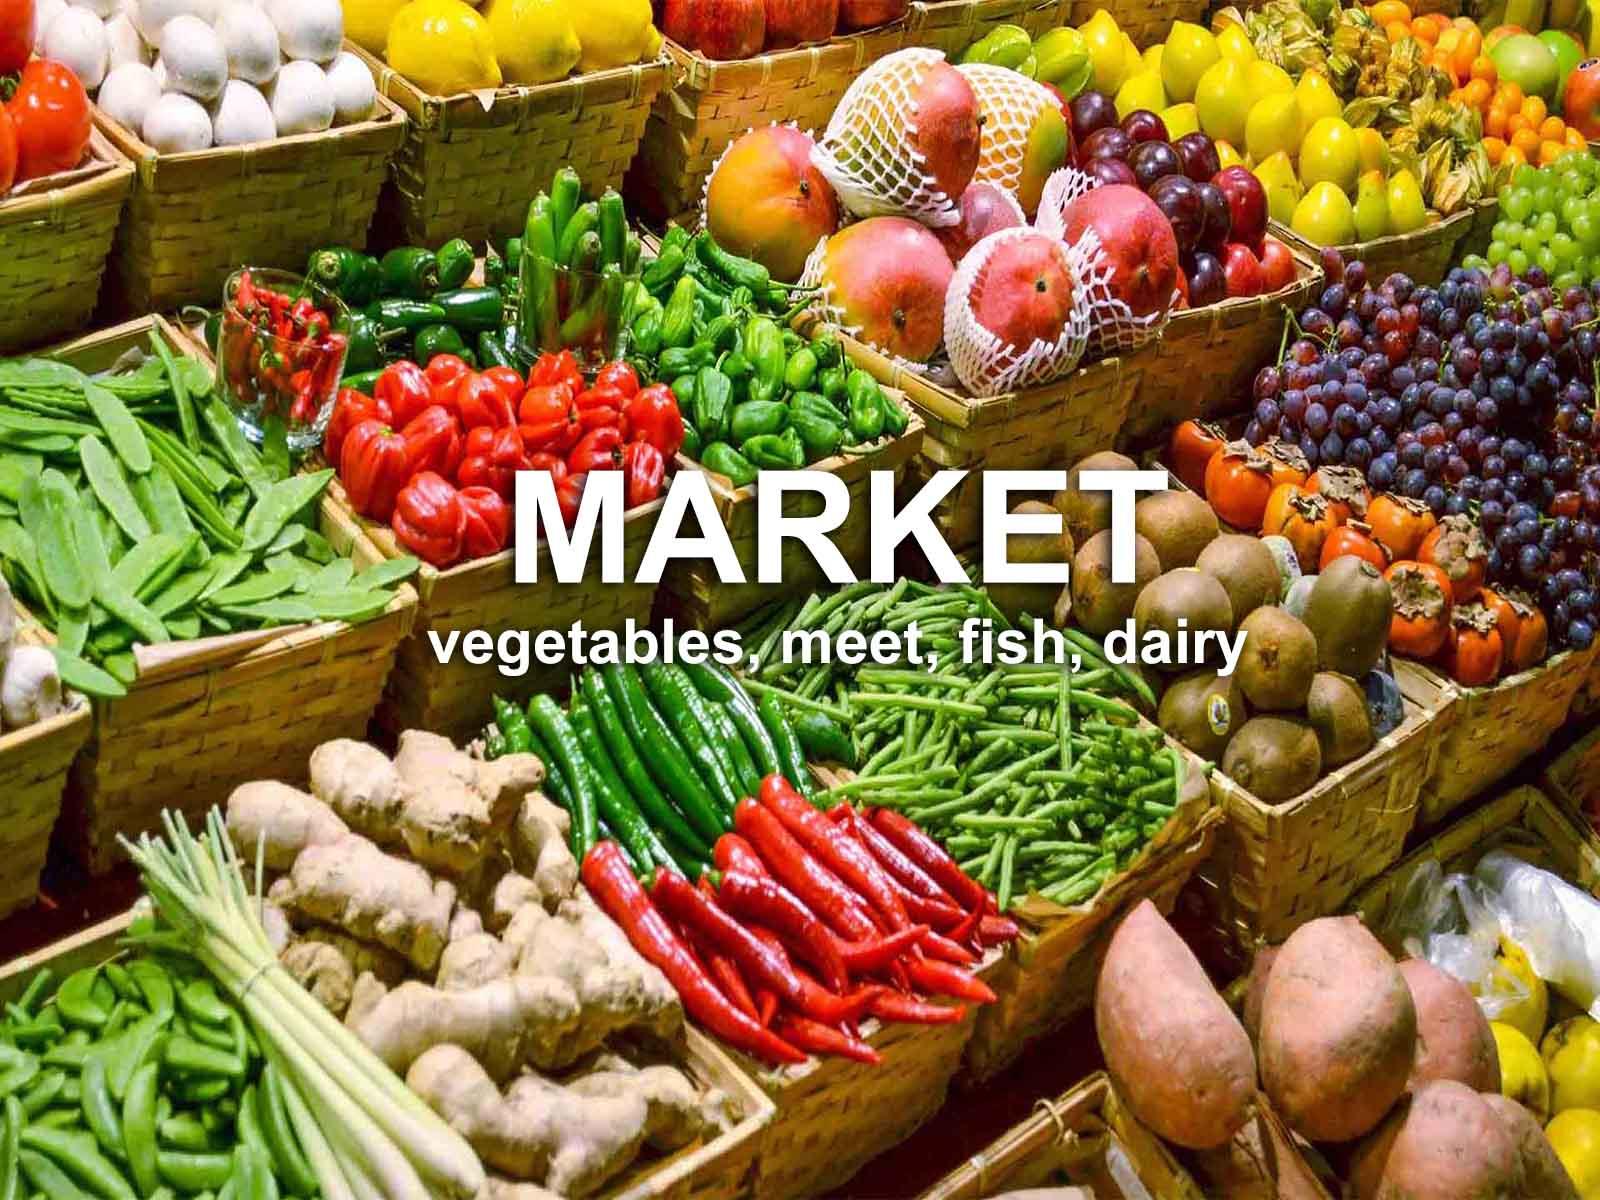 03_Mercado_Merced_.Market_1600x1200